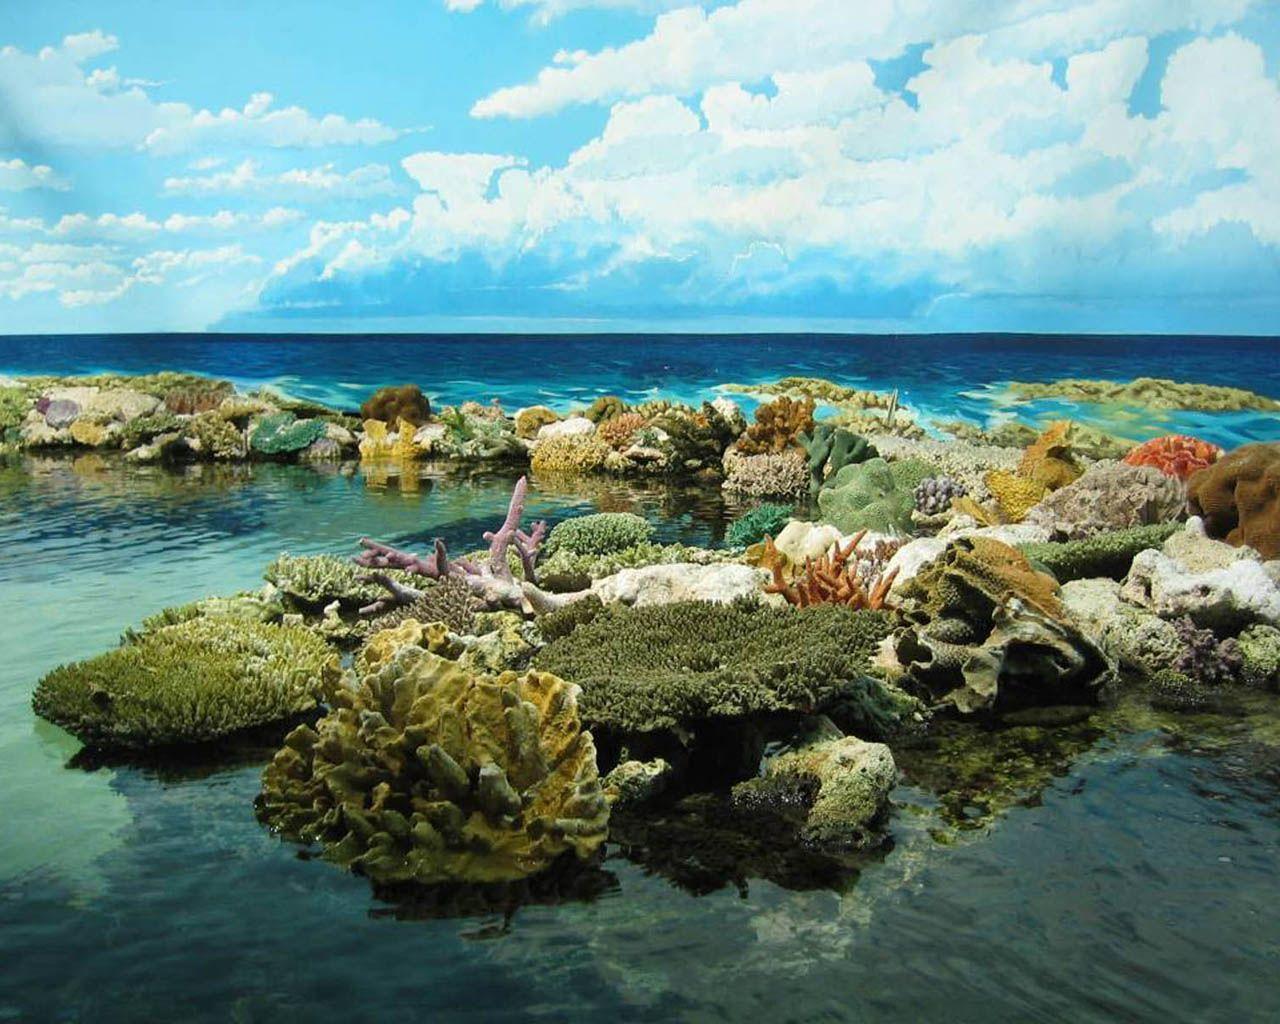 Great Barrier Reef Wallpapers - Wallpaper Cave